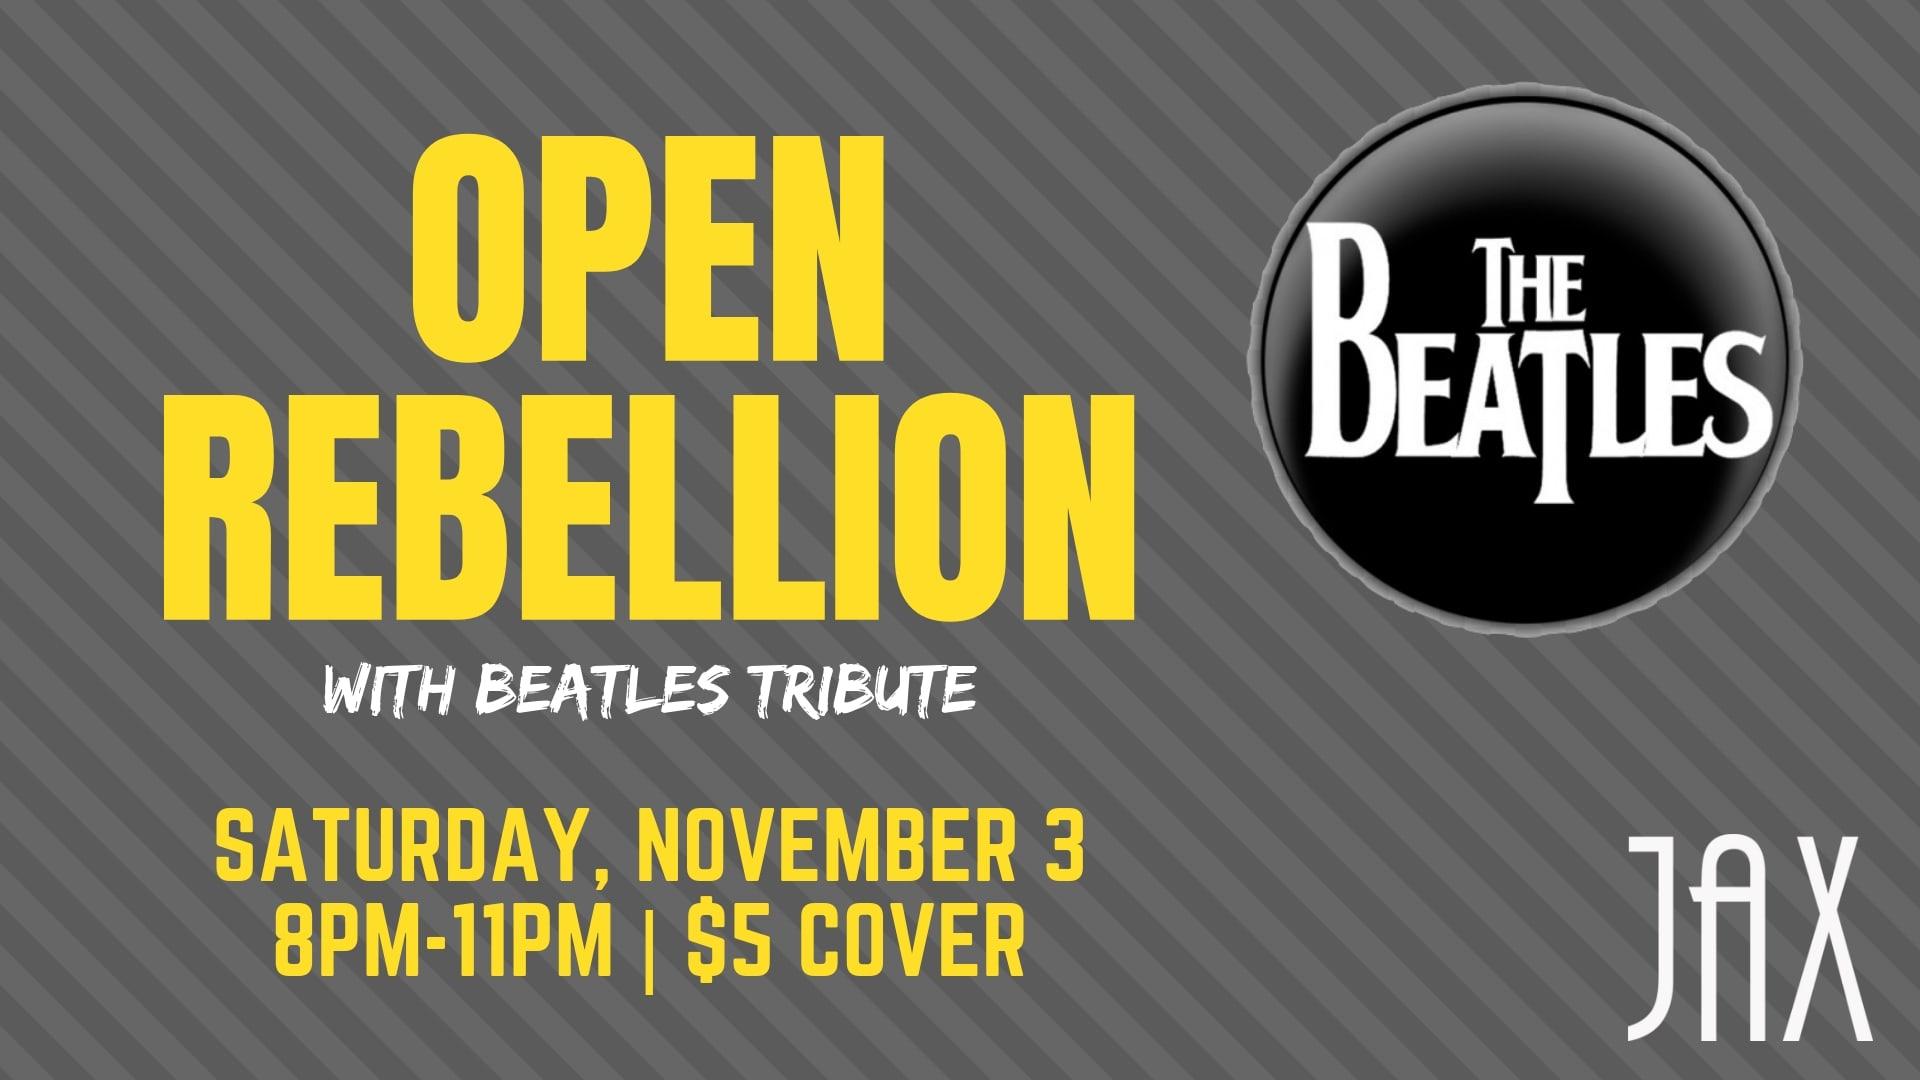 November 3 | OPEN REBELLION with BEATLES TRIBUTE